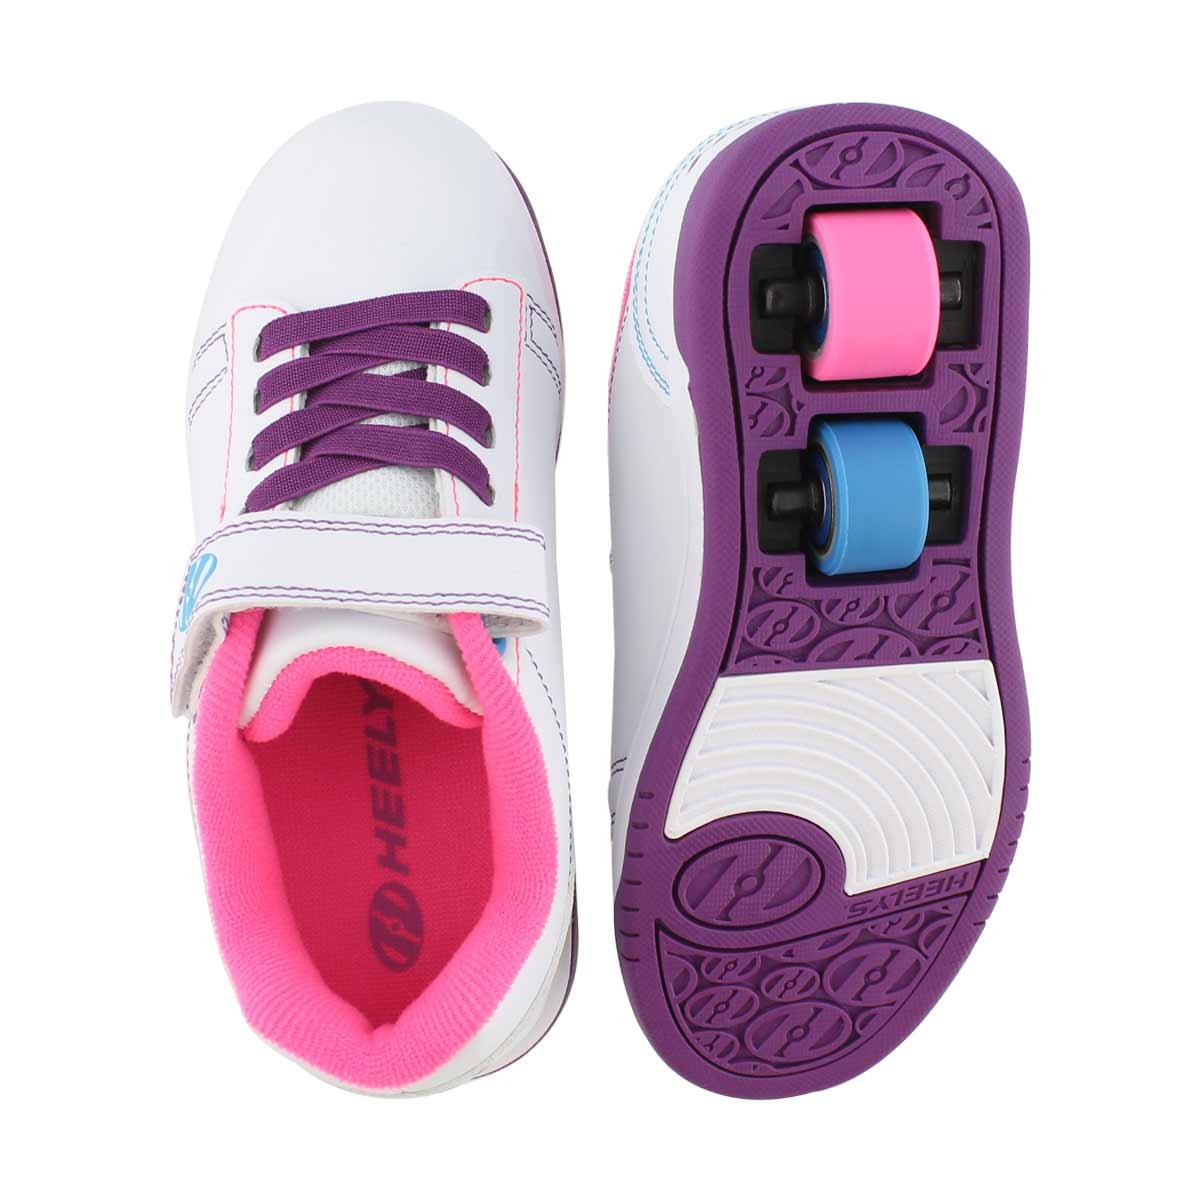 Grls Dual Up x2 wht/ppl/pk skate sneaker